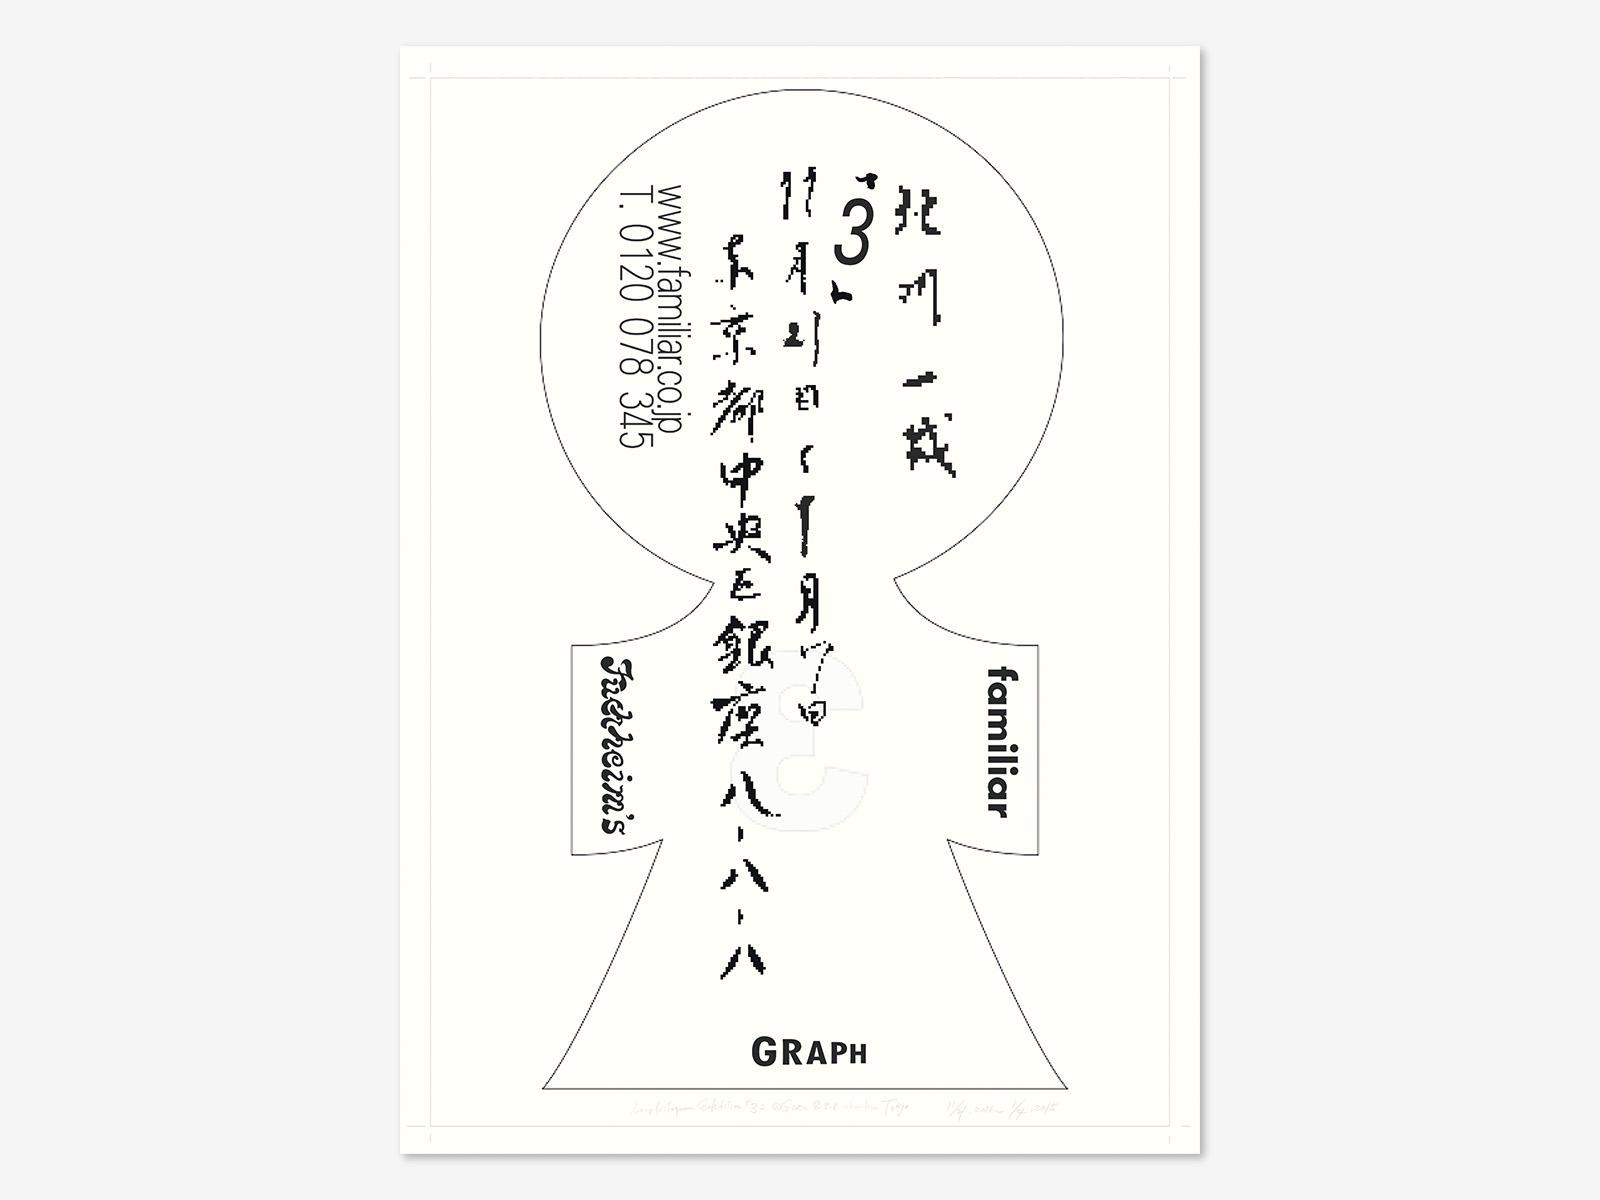 poster_出力8Gz_1